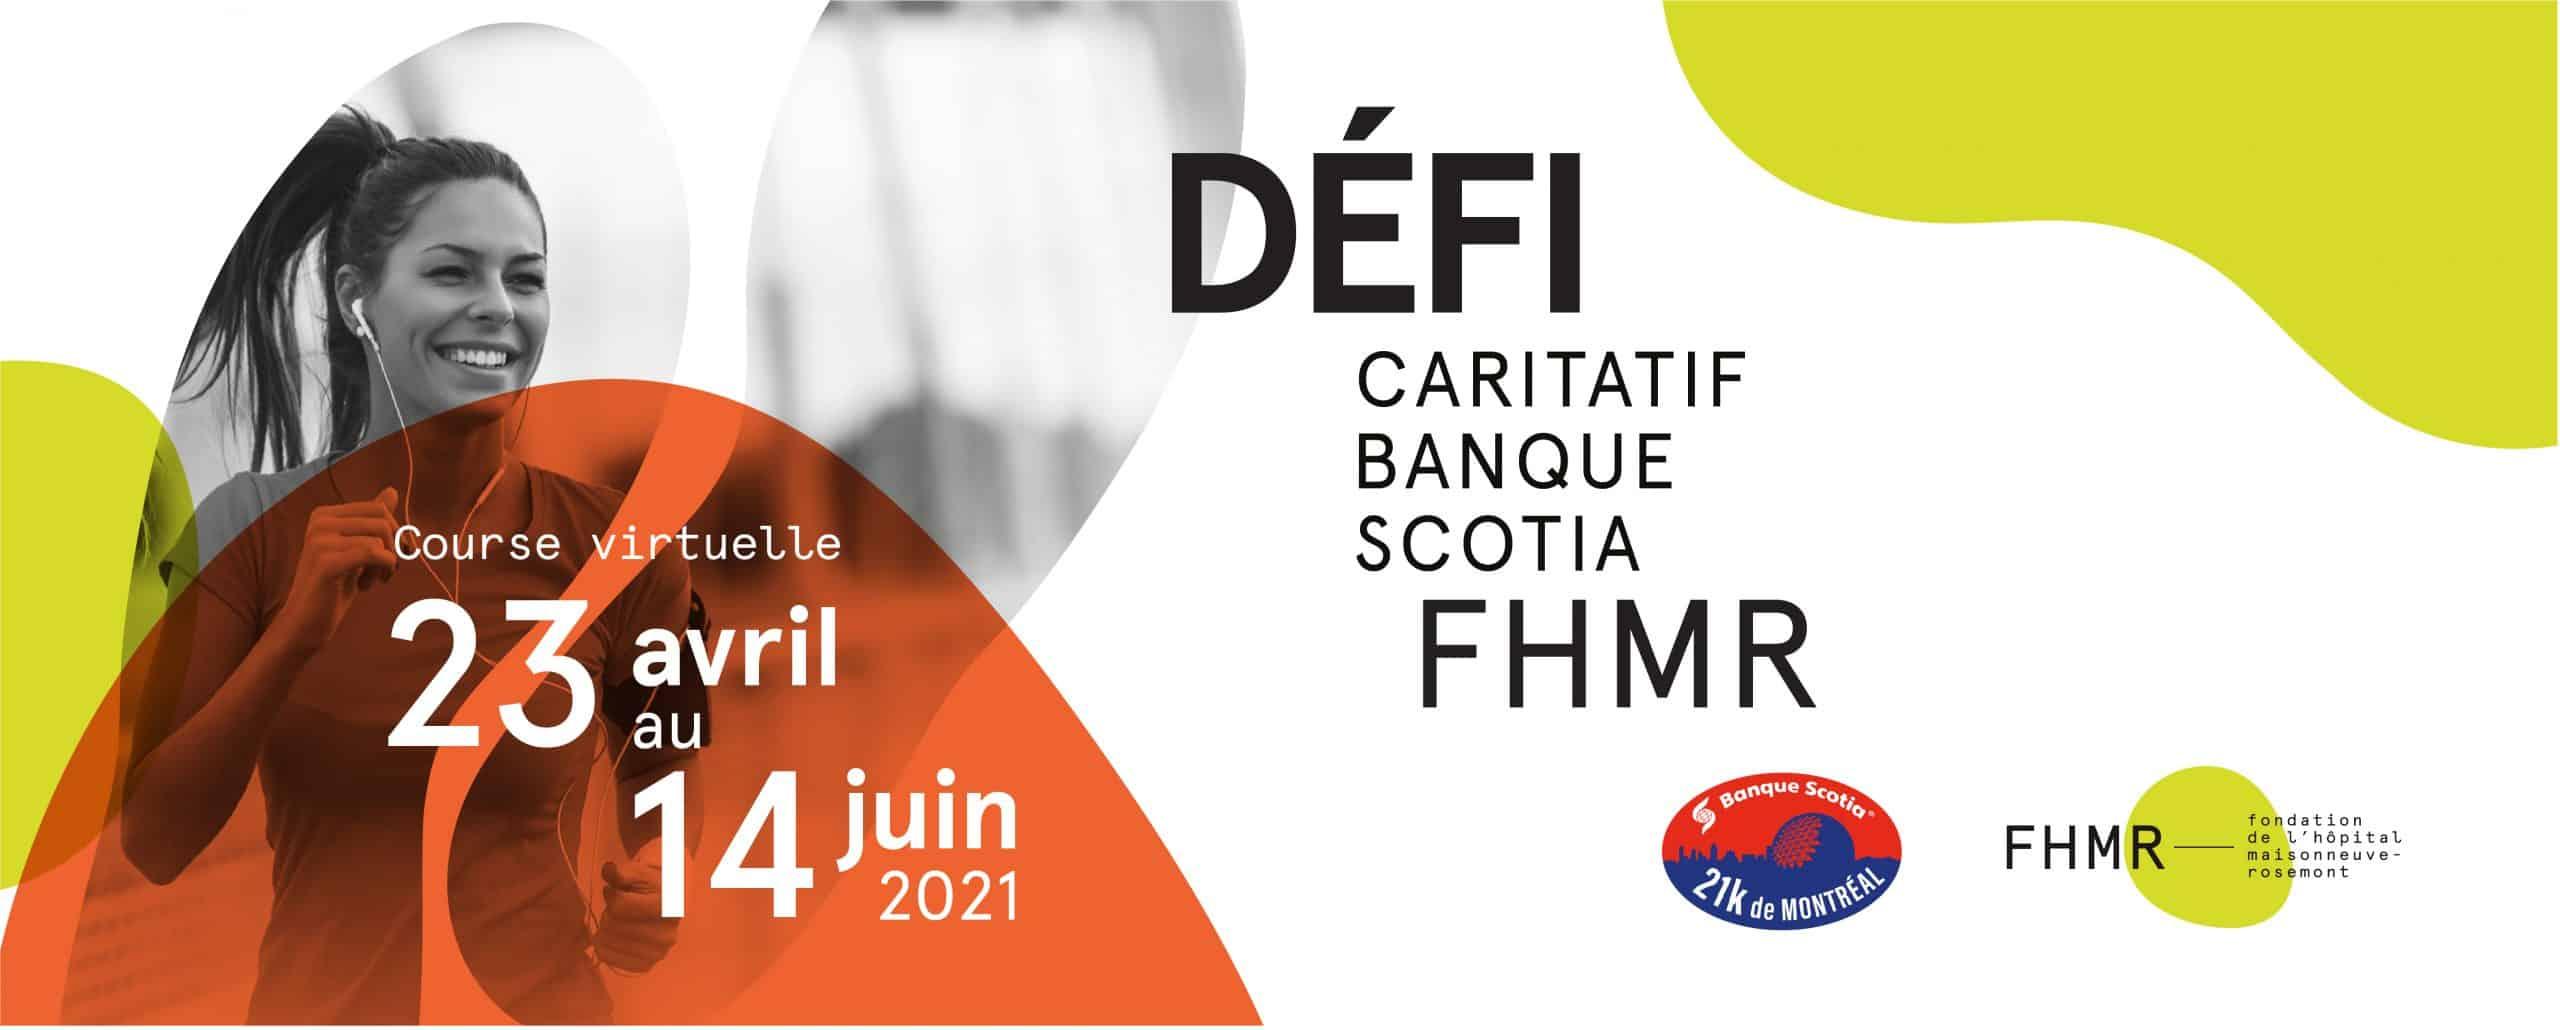 Défi caritatif Banque Scotia FHMR